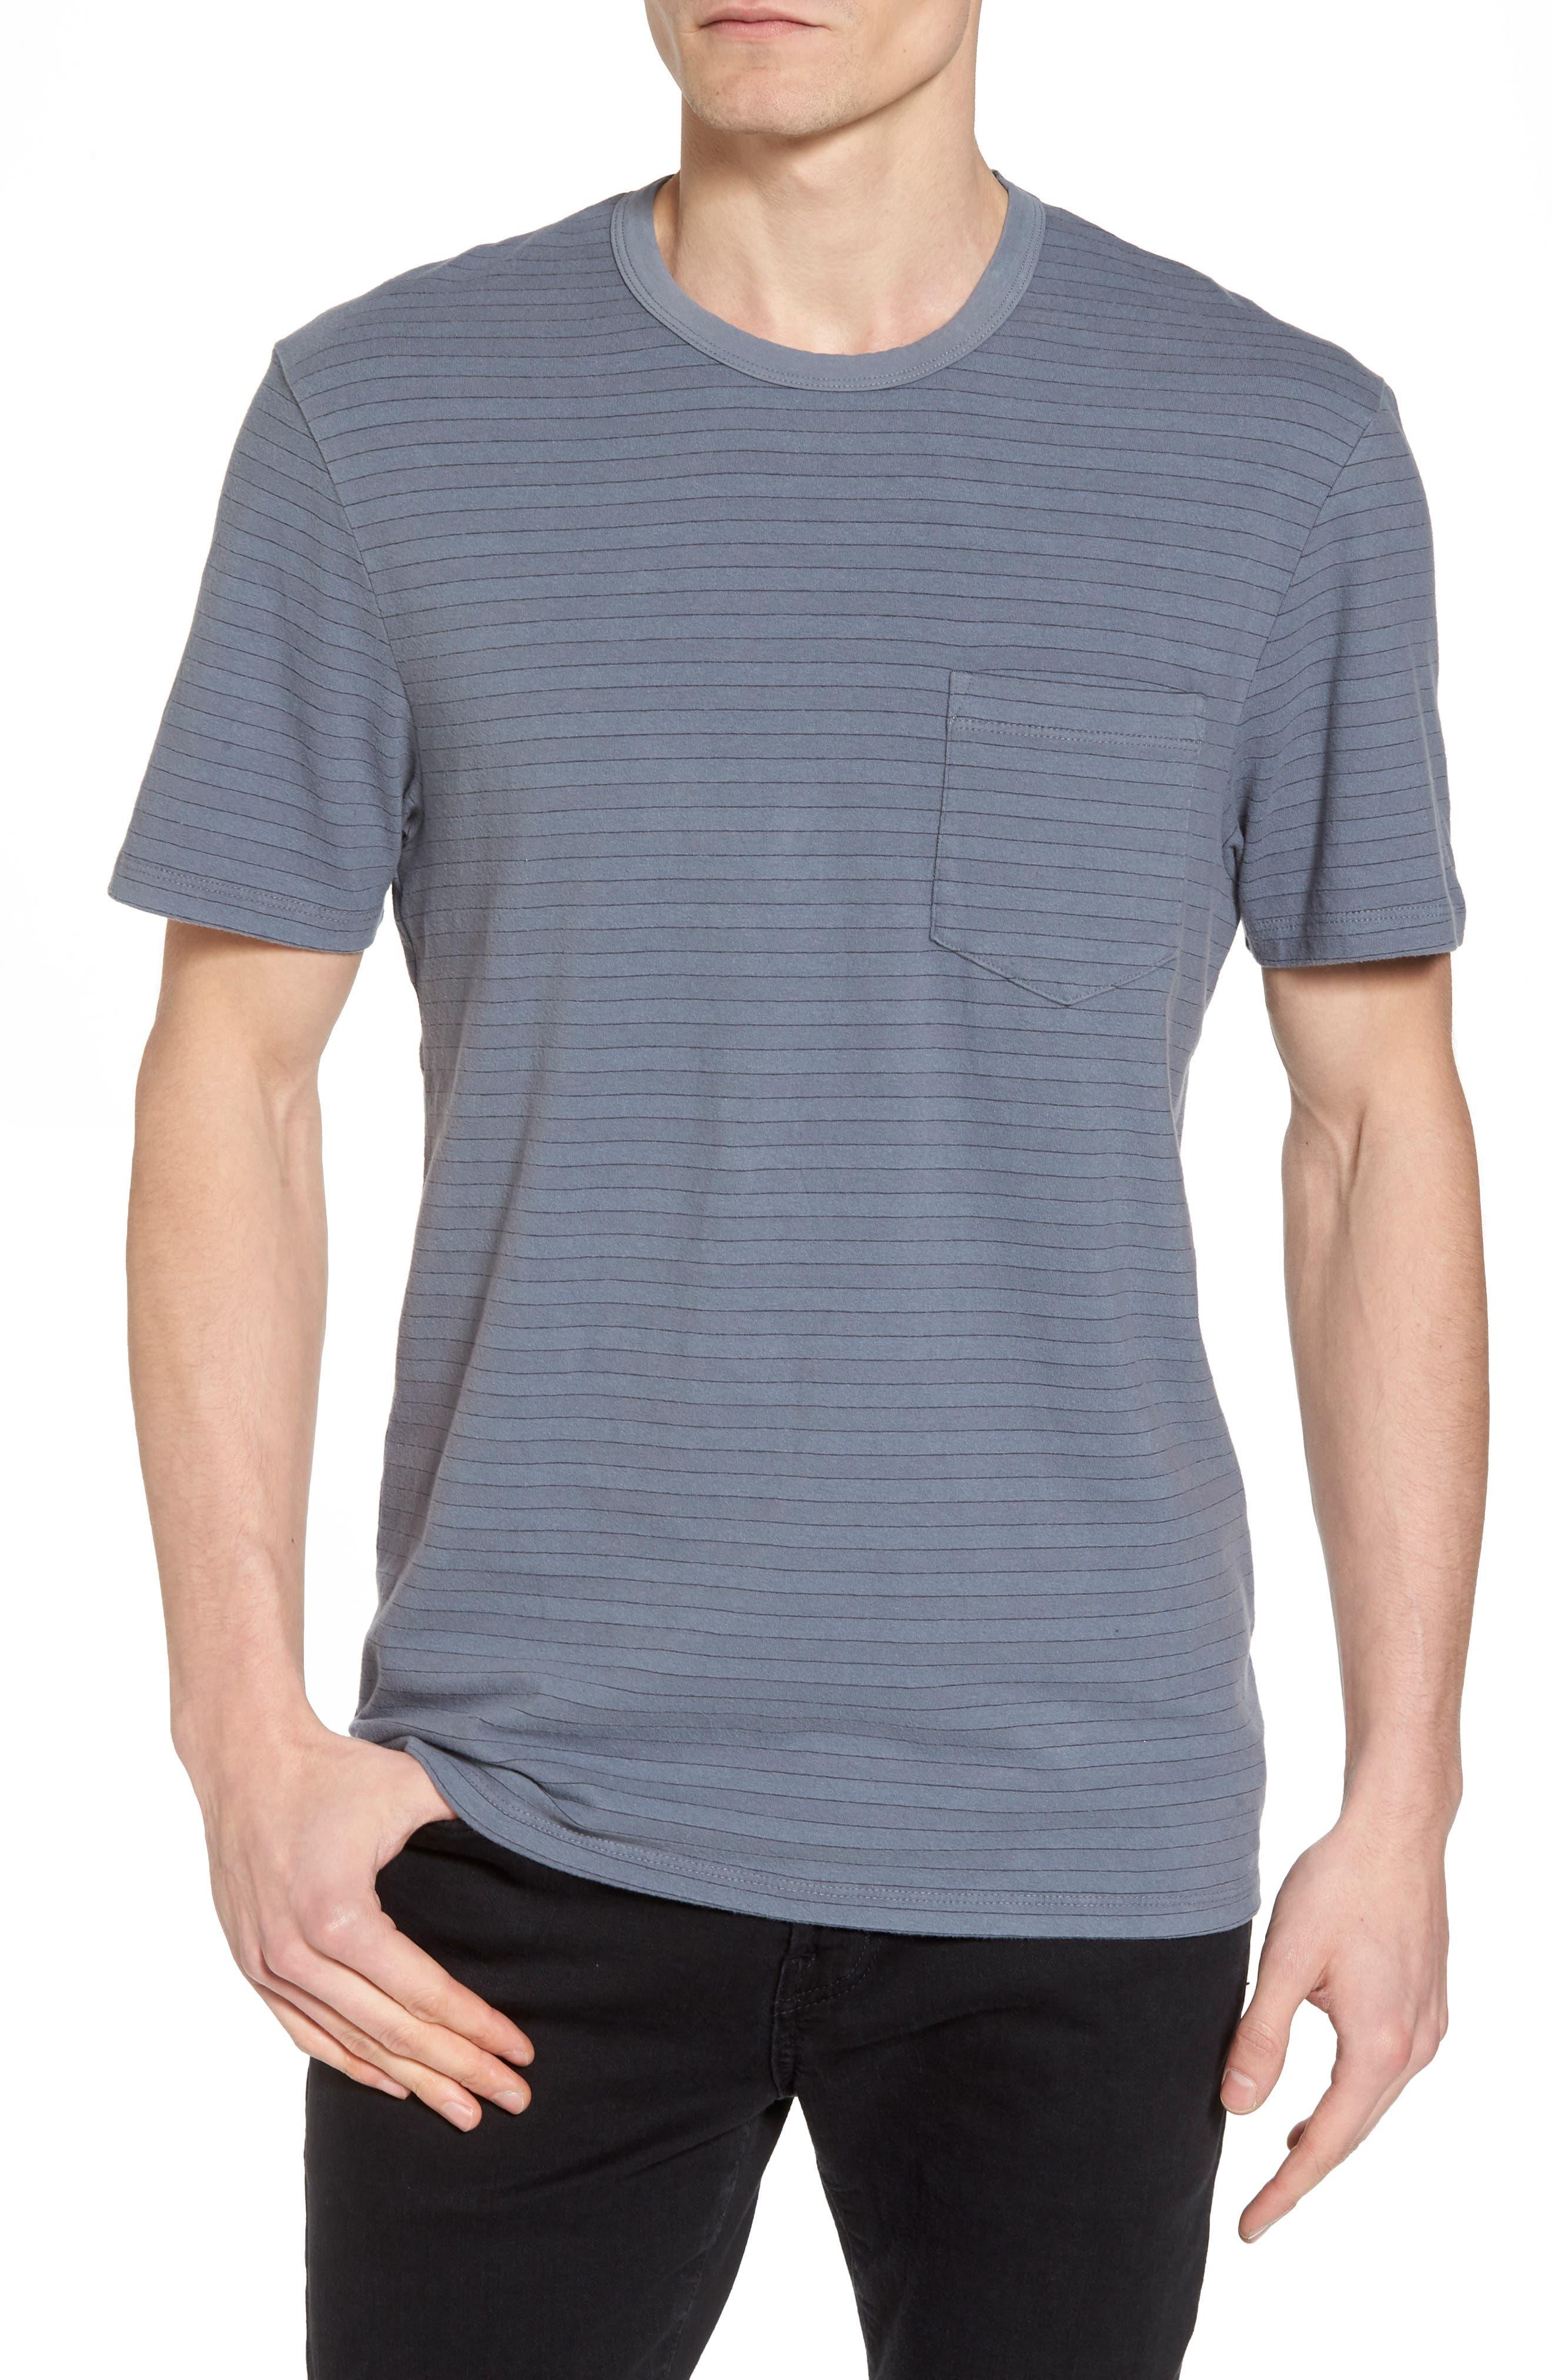 James Perse Shadow Stripe Pocket T-Shirt